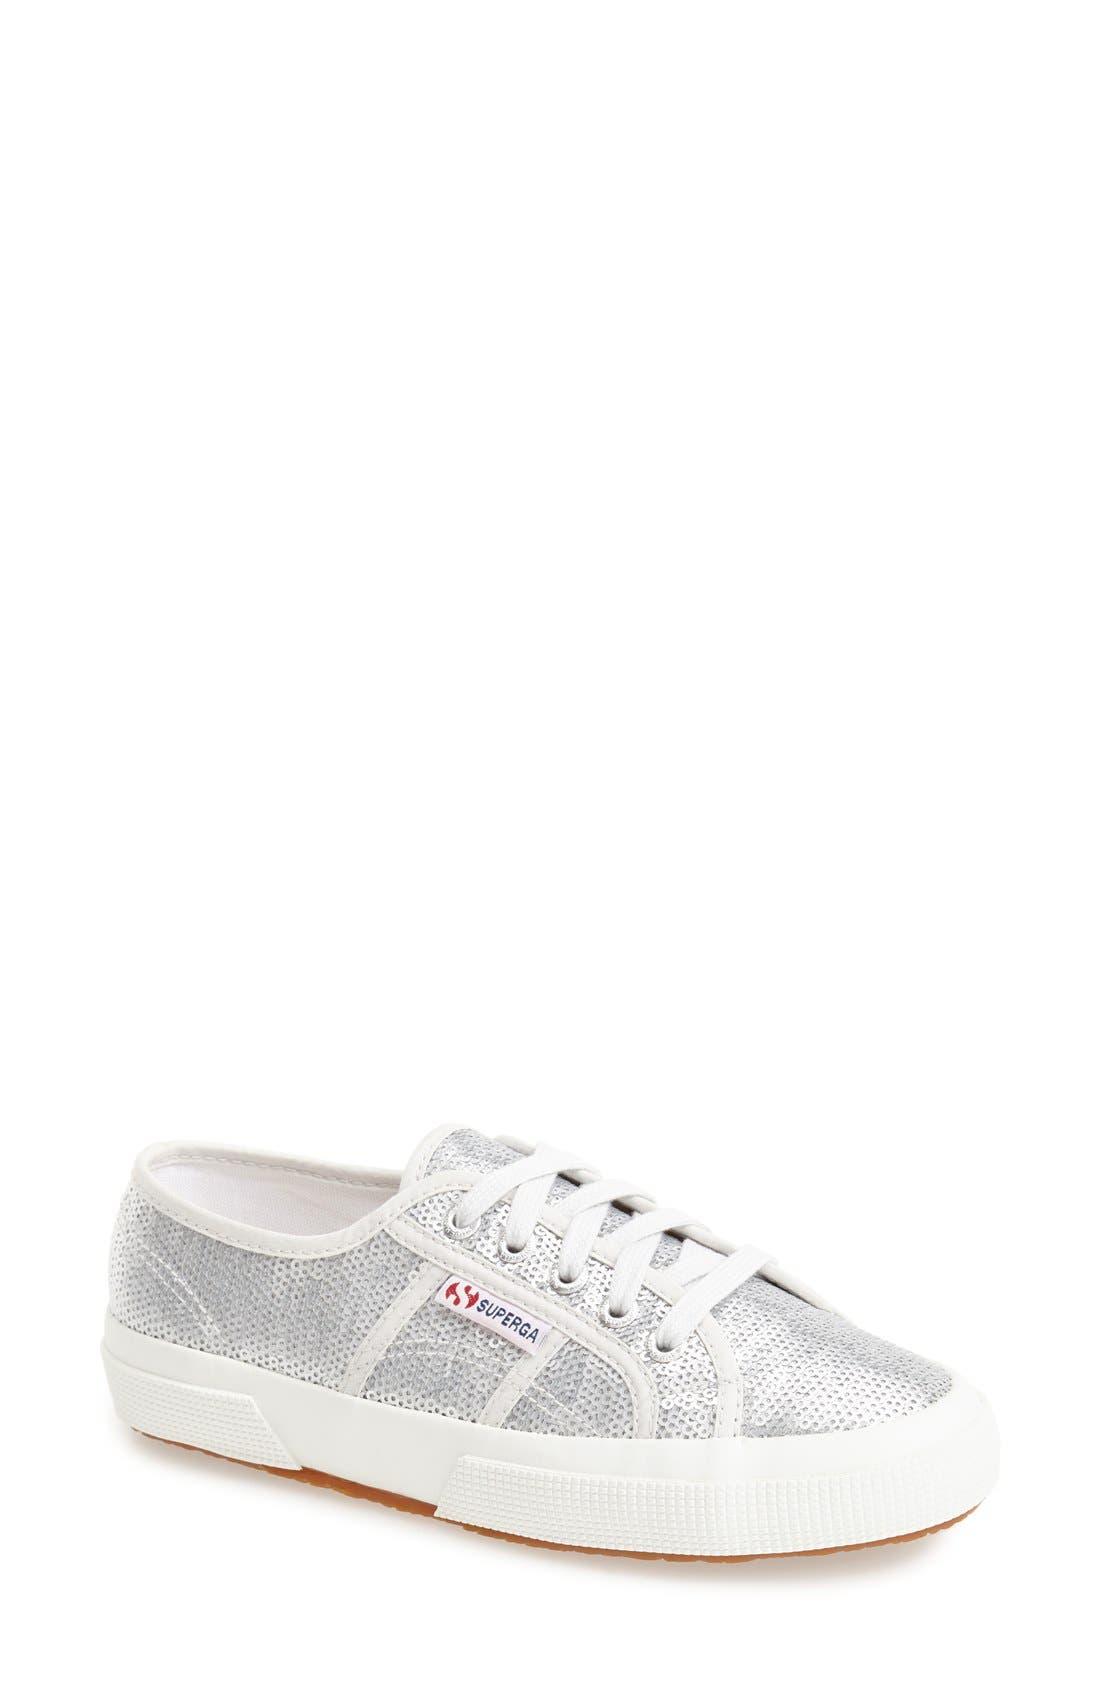 Alternate Image 1 Selected - Superga 'Metallic' Sneaker (Women)